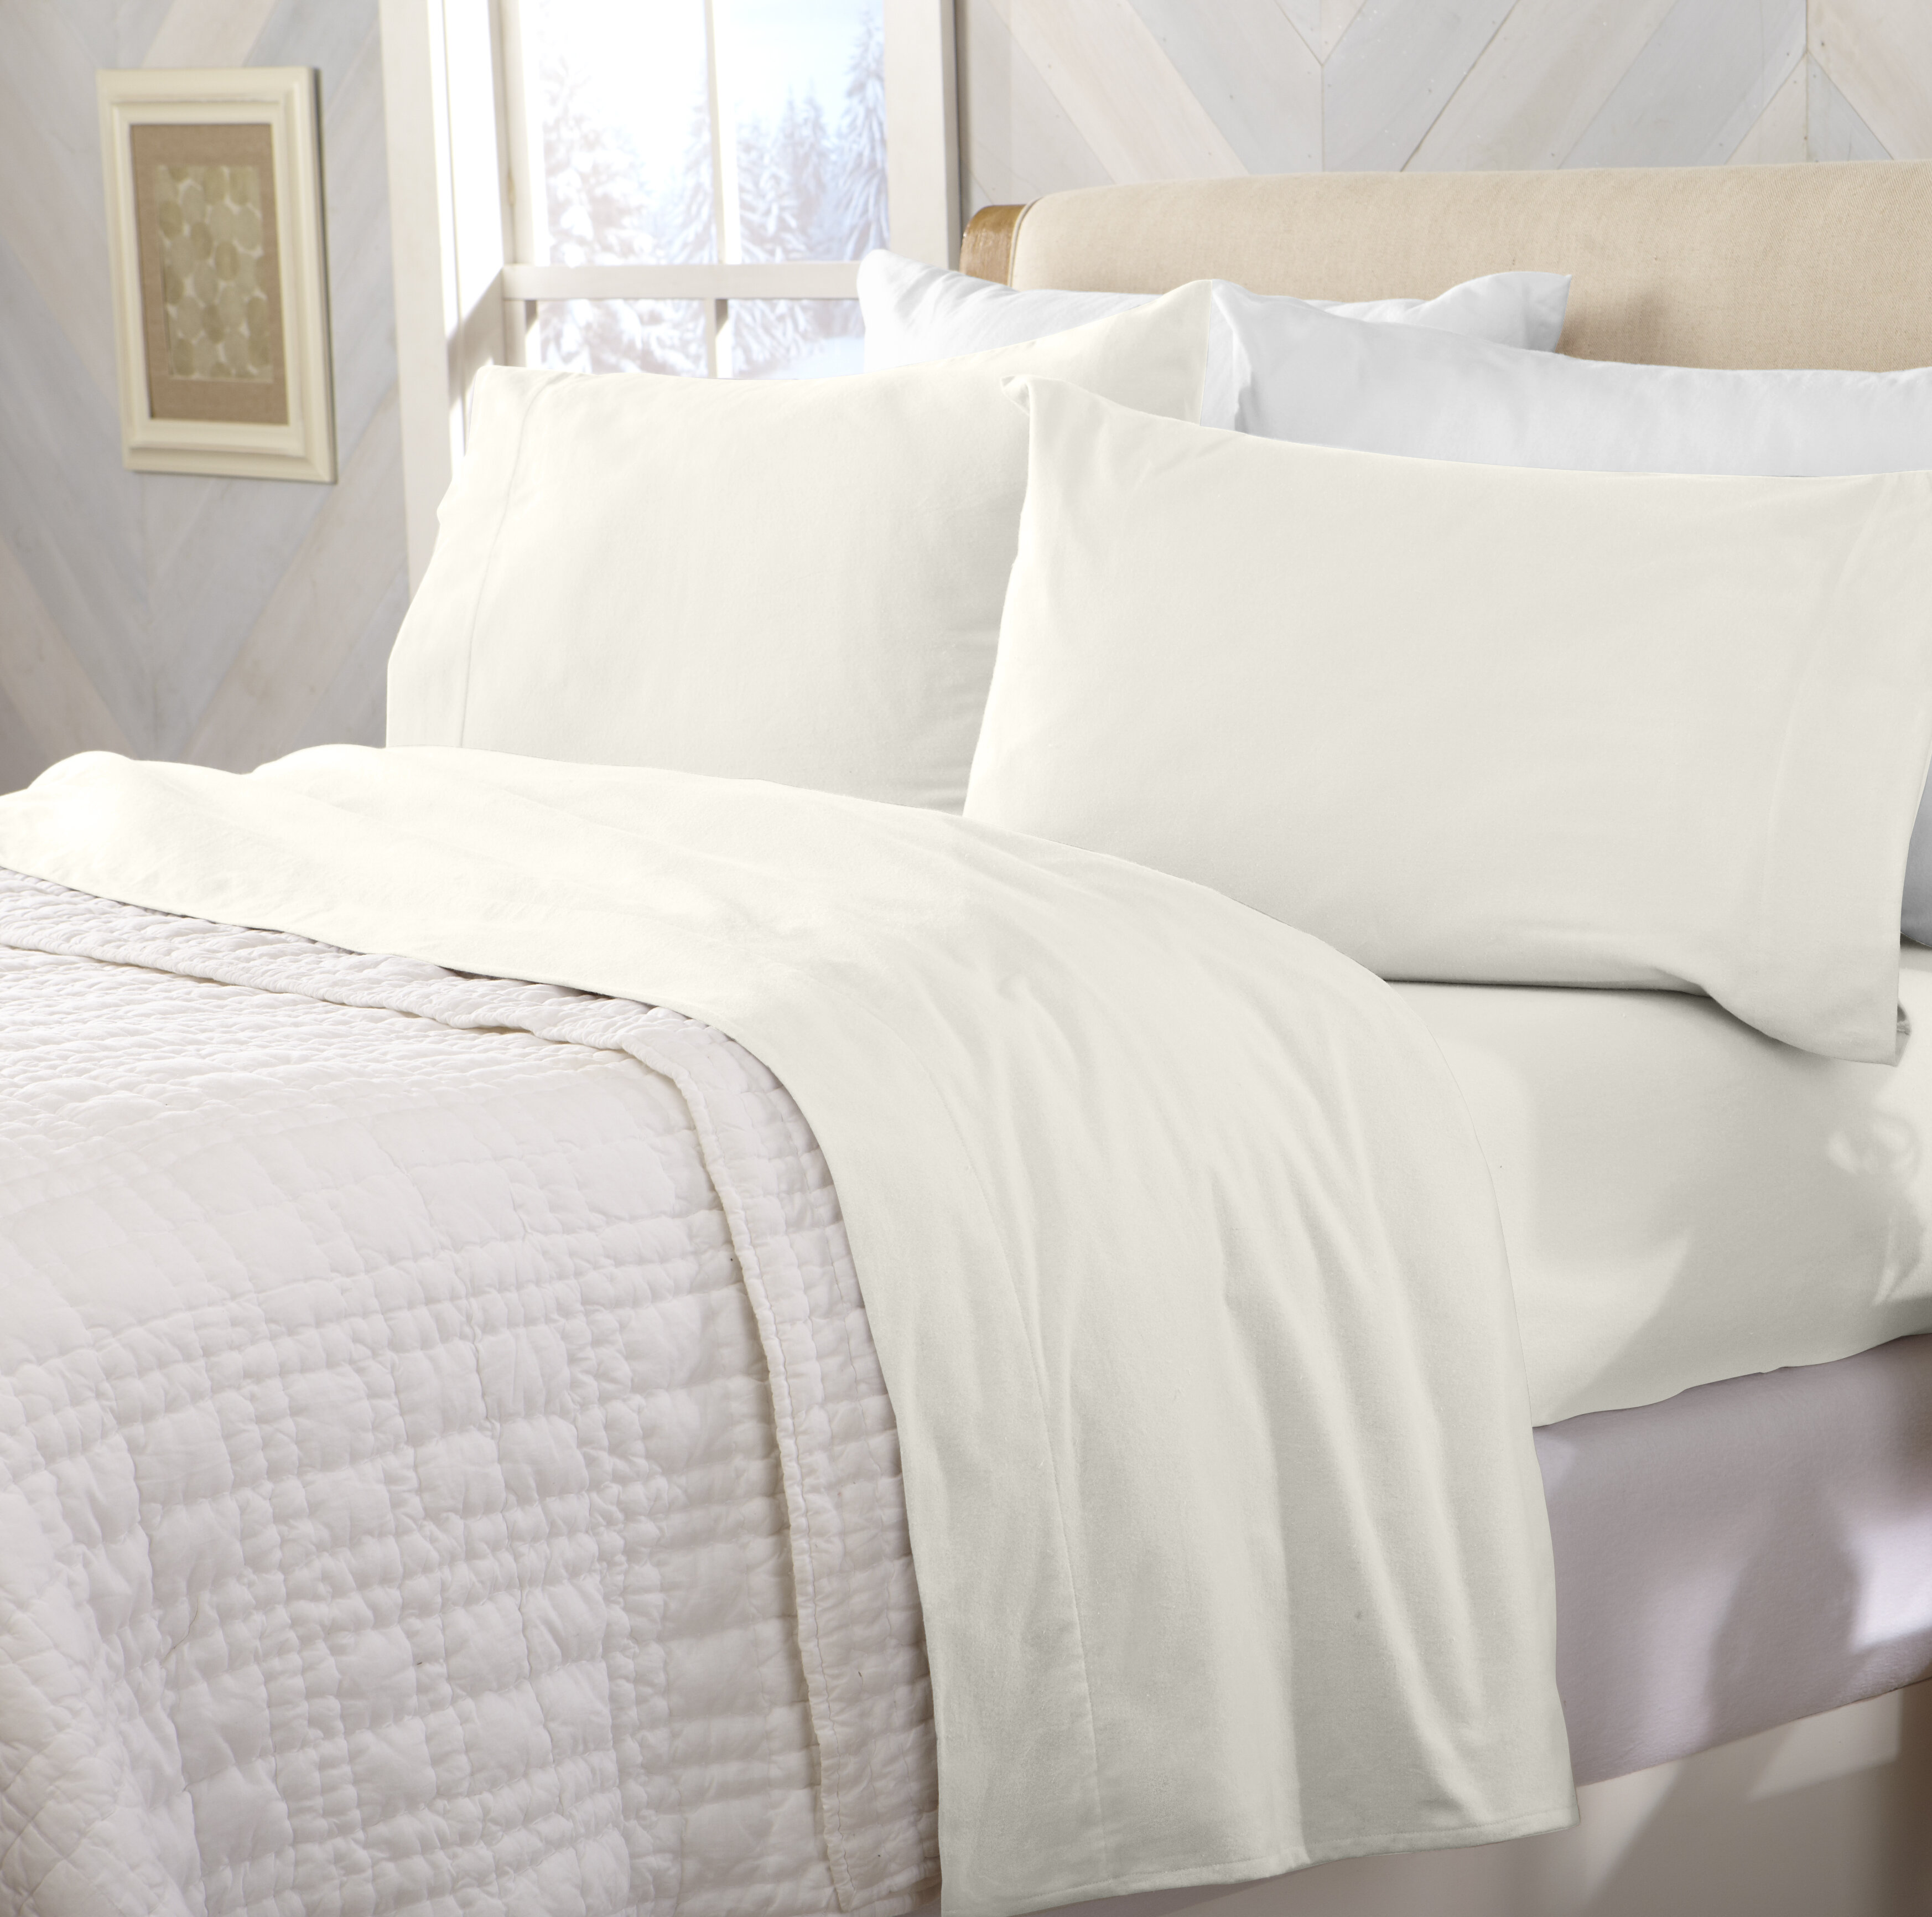 Peter Super Soft Solid Flannel 100 Turkish Cotton Sheet Set Reviews Allmodern